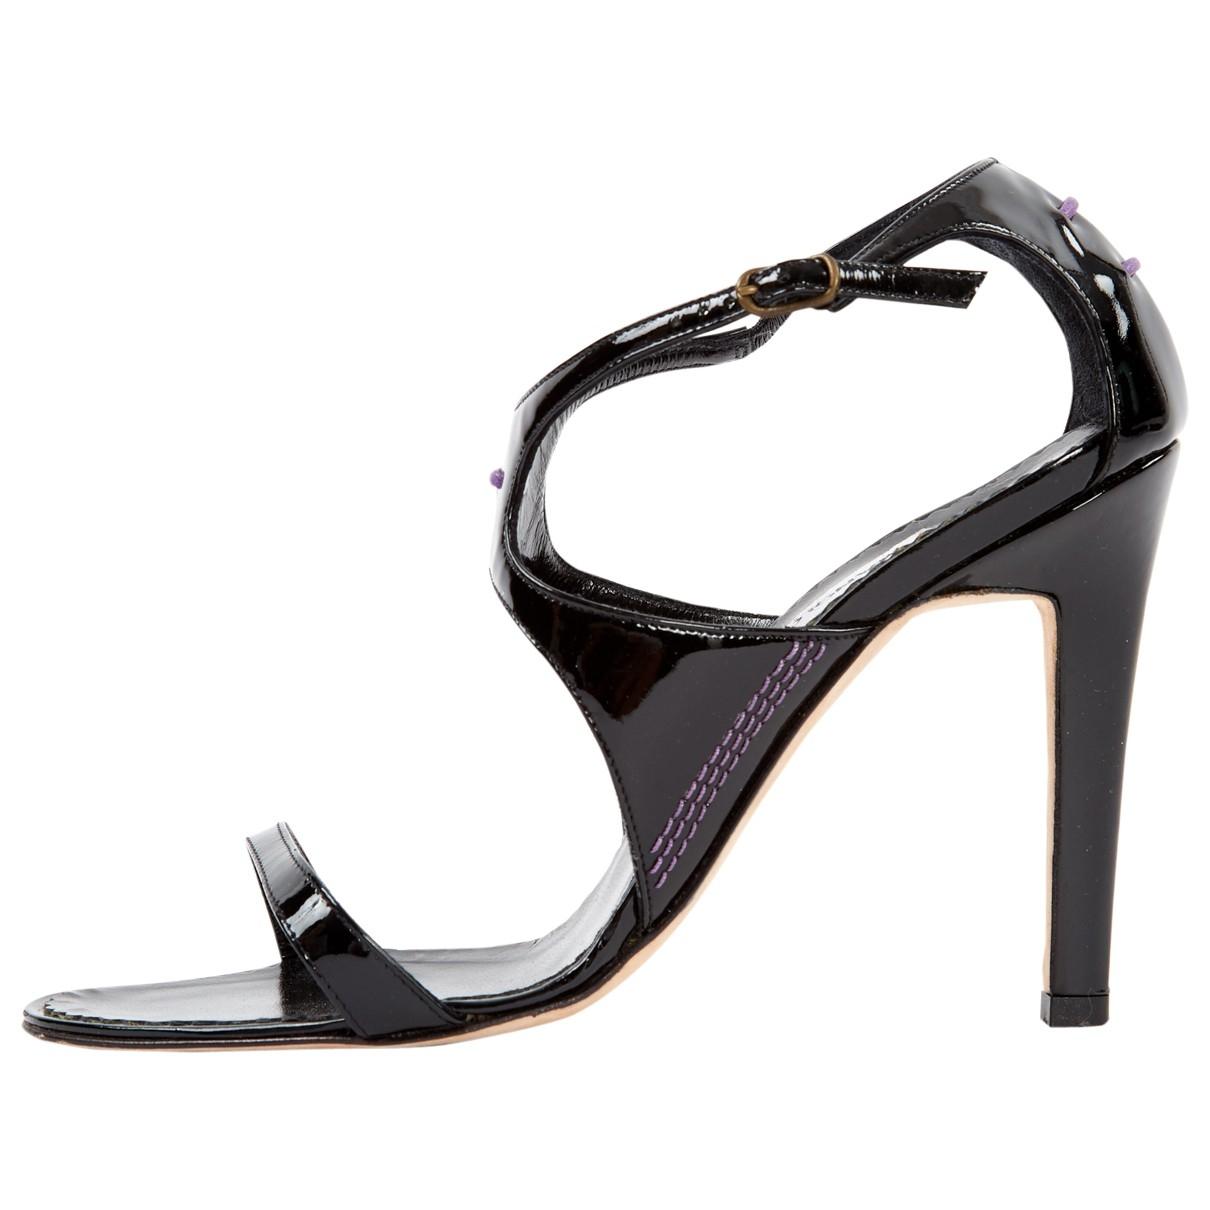 Manolo Blahnik \N Black Patent leather Sandals for Women 36.5 EU